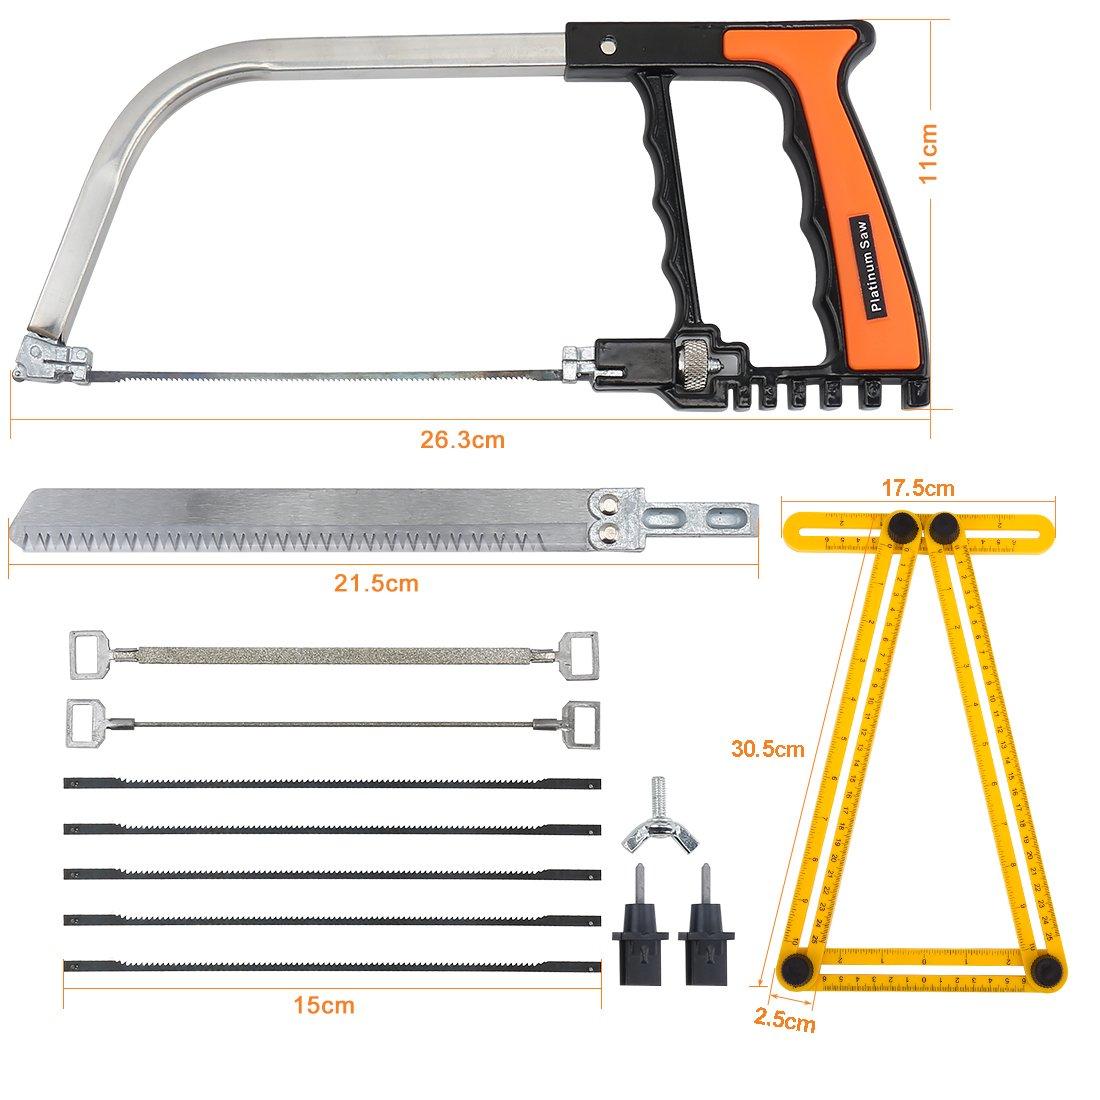 Handsaws Set, Four Fold Ruler, Multifunction Bow Saw +Angle Measuring Ruler for Engineer Handymen Builders Craftsmen by SILIVN by SILIVN (Image #2)